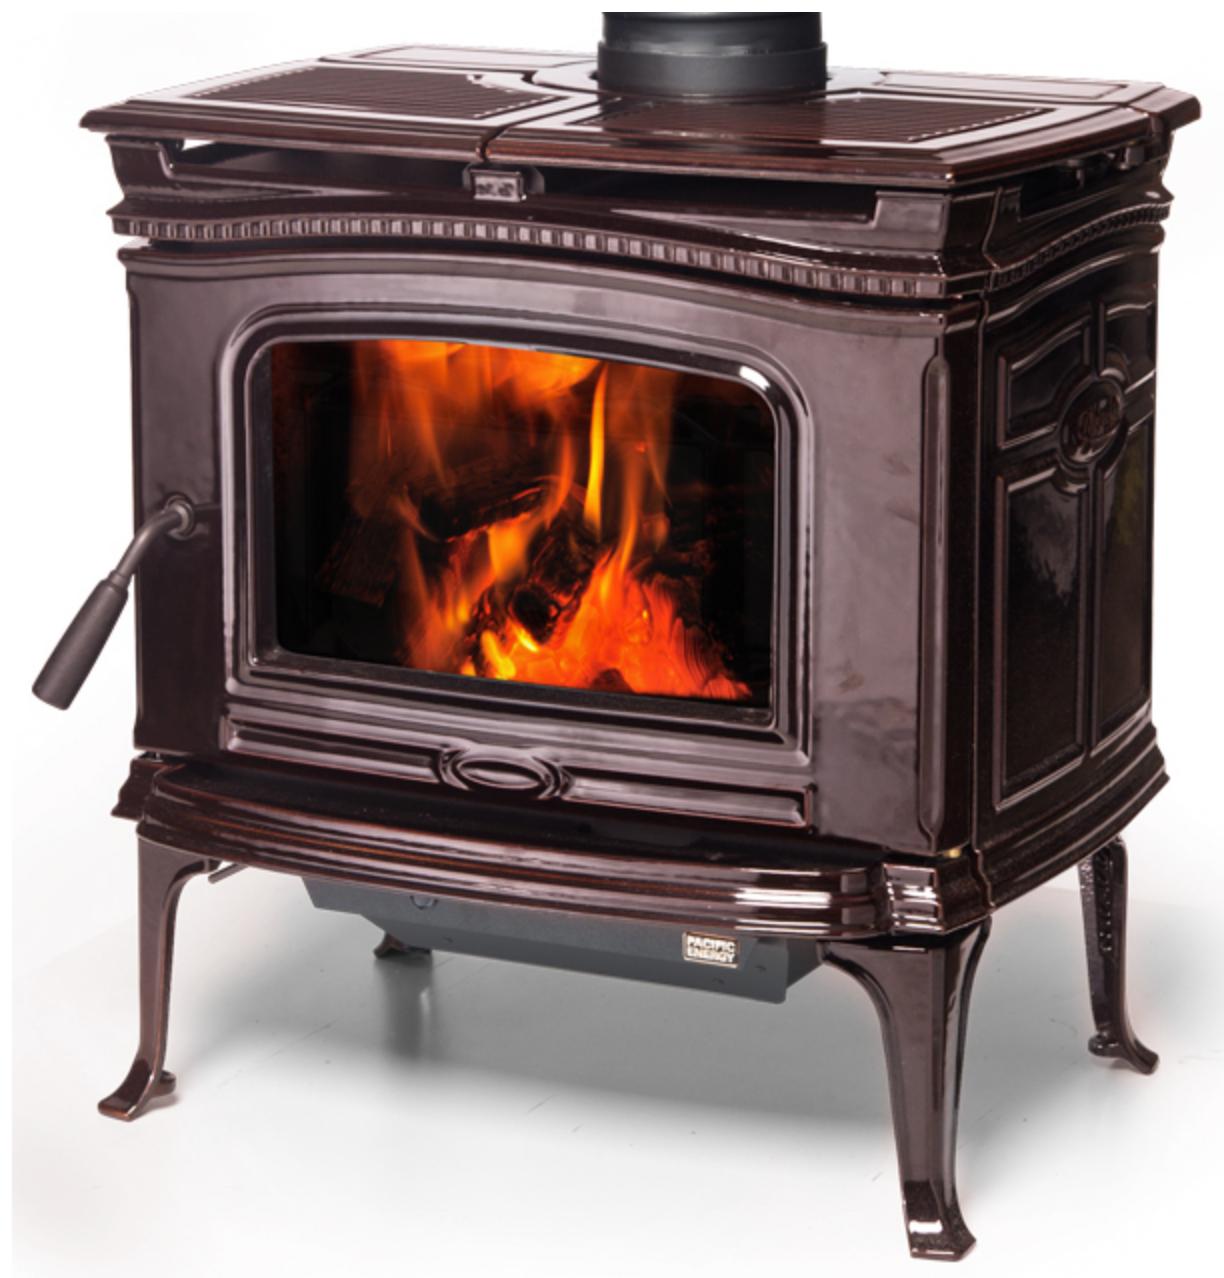 Alderlea T4 Wood Heater Heats 200 M2 Energy Hothouse